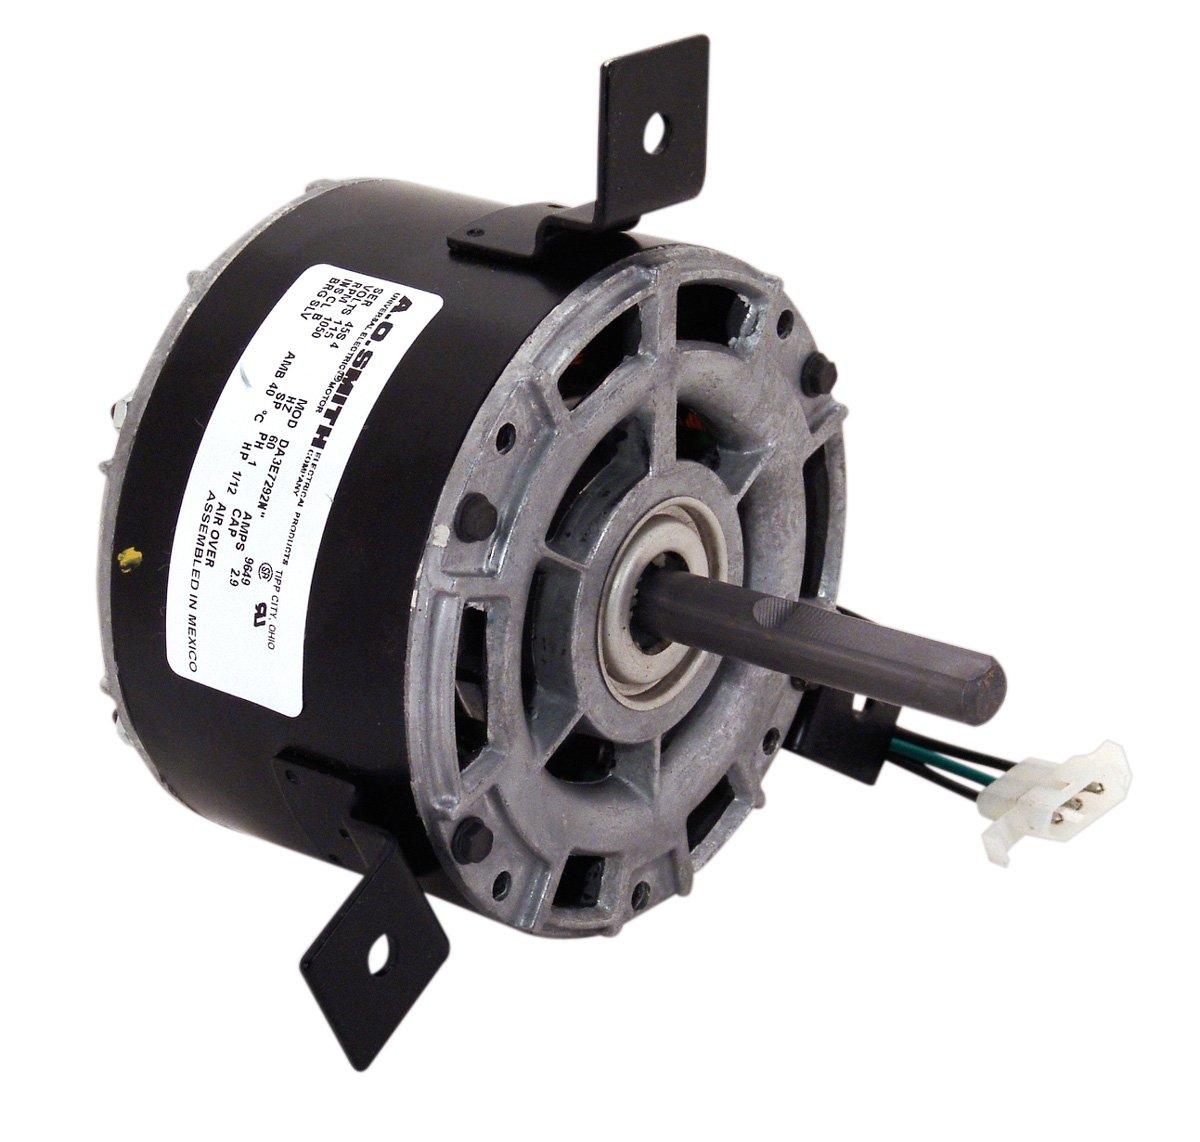 AO Smith 96495.0-Inch Frame Diameter 1/12 HP 1050 RPM 115-Volt 2.9-Amp Sleeve Bearing Blower Motor